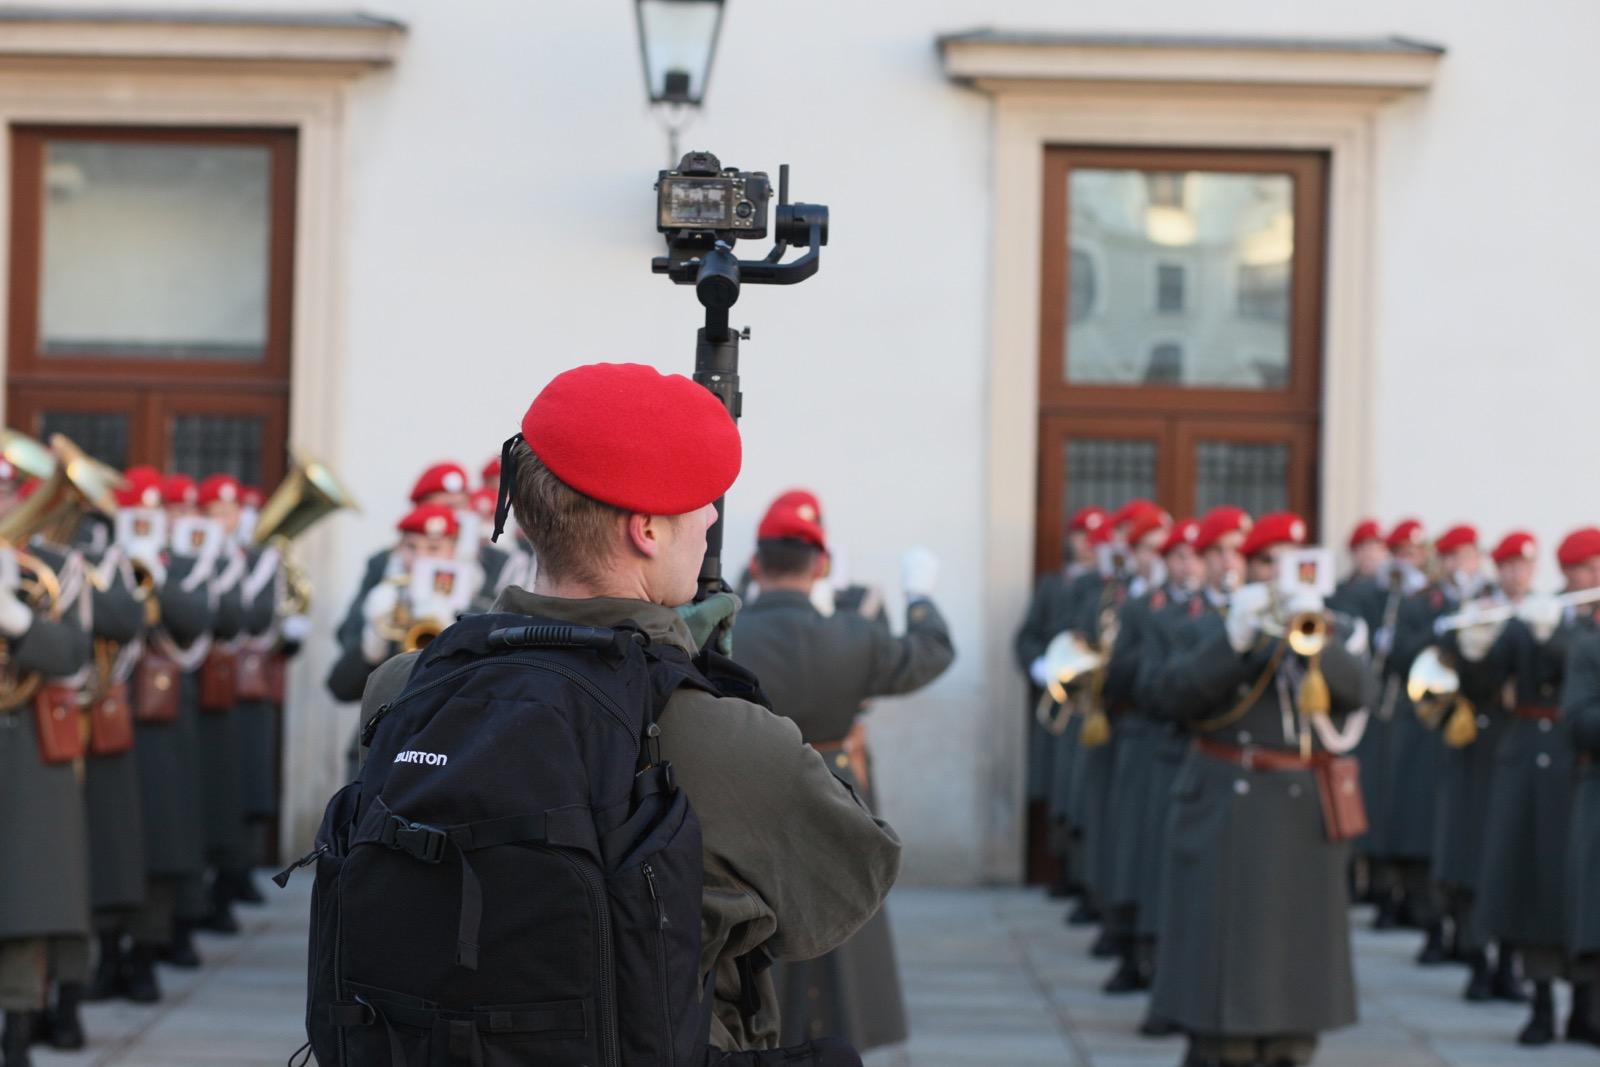 2019_01_11_1Gardekompanie_HBP_SUI_Präsident_Schweiz_Burghof - 17 of 36